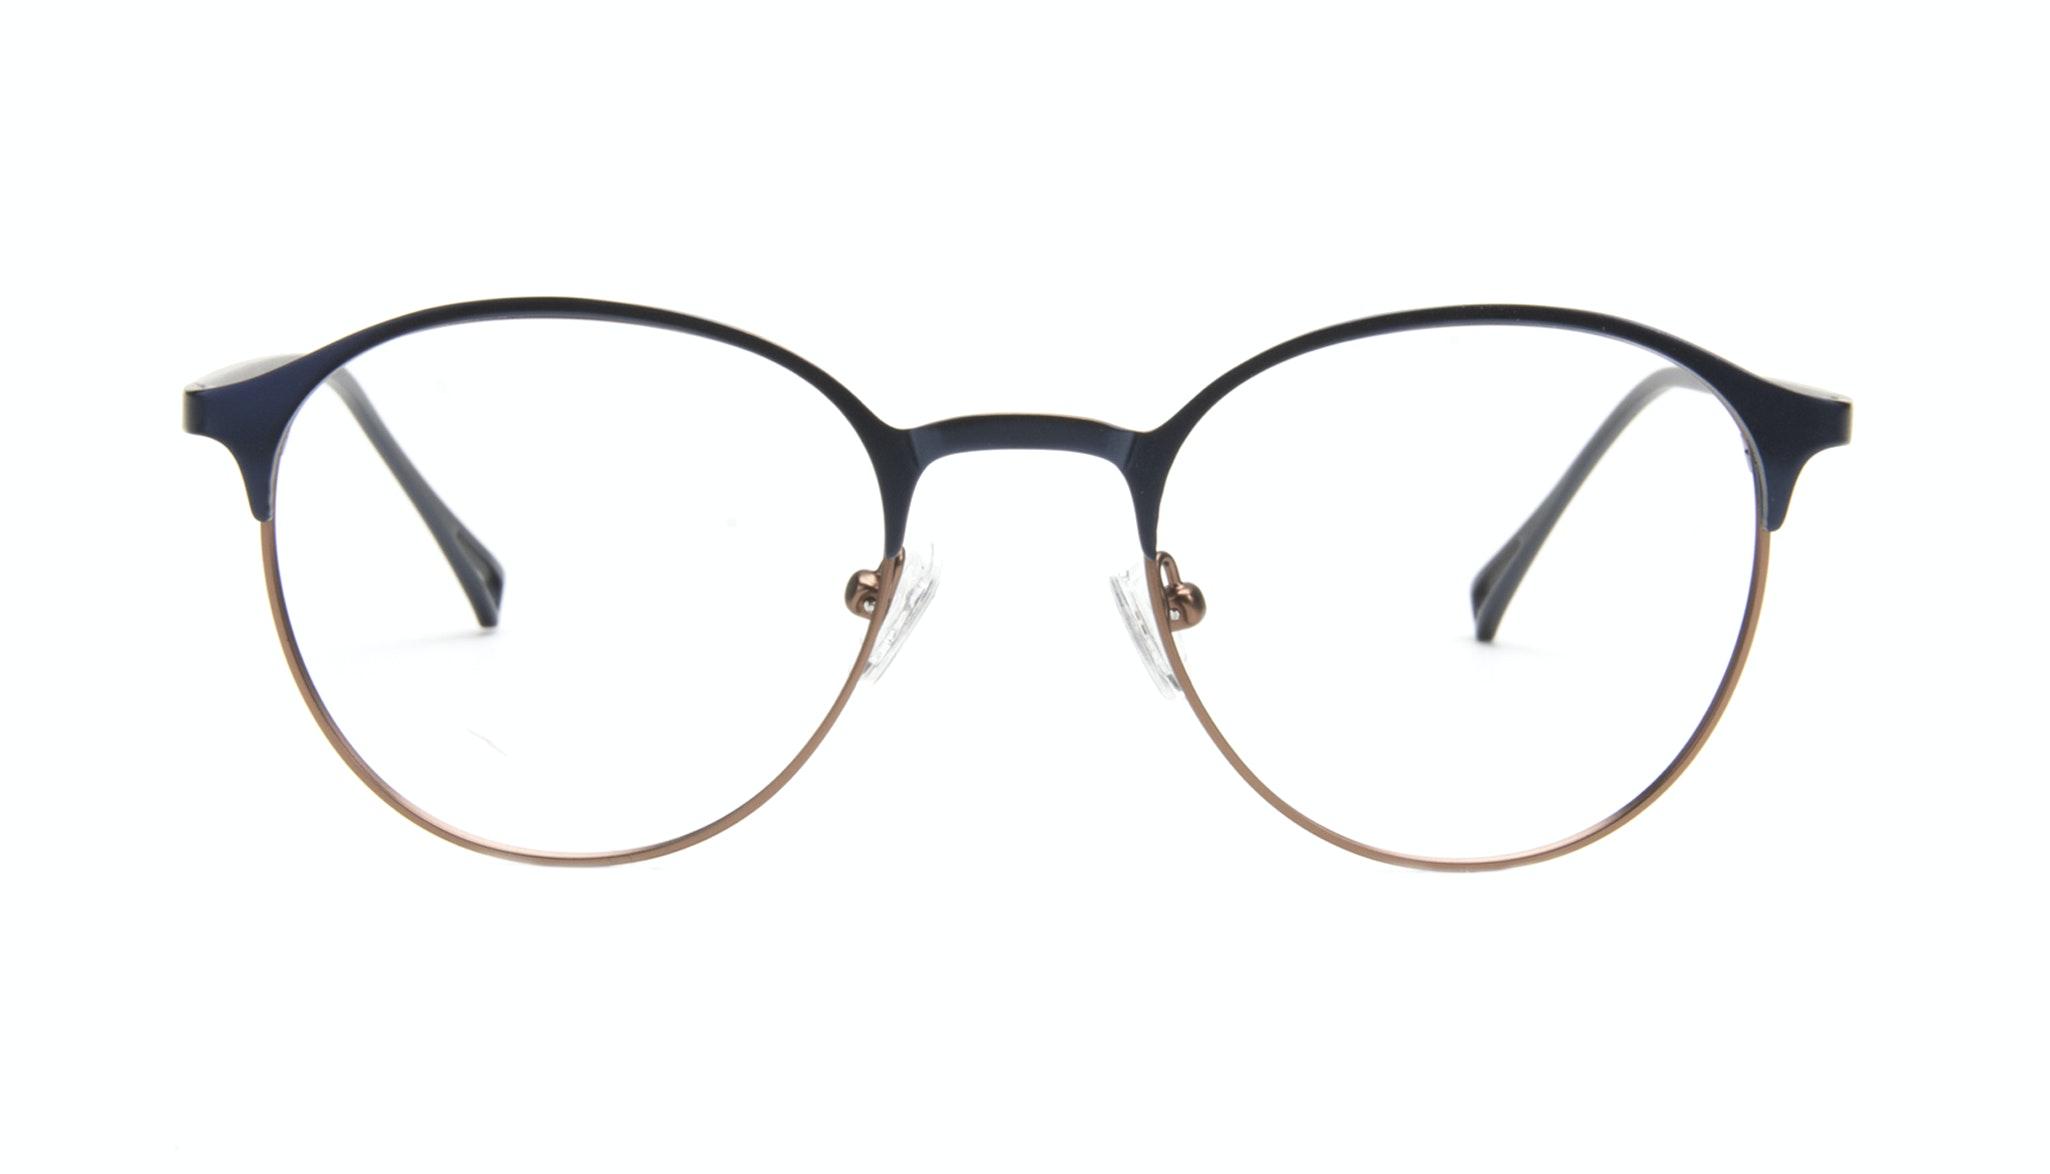 Affordable Fashion Glasses Round Eyeglasses Women Bay Marine